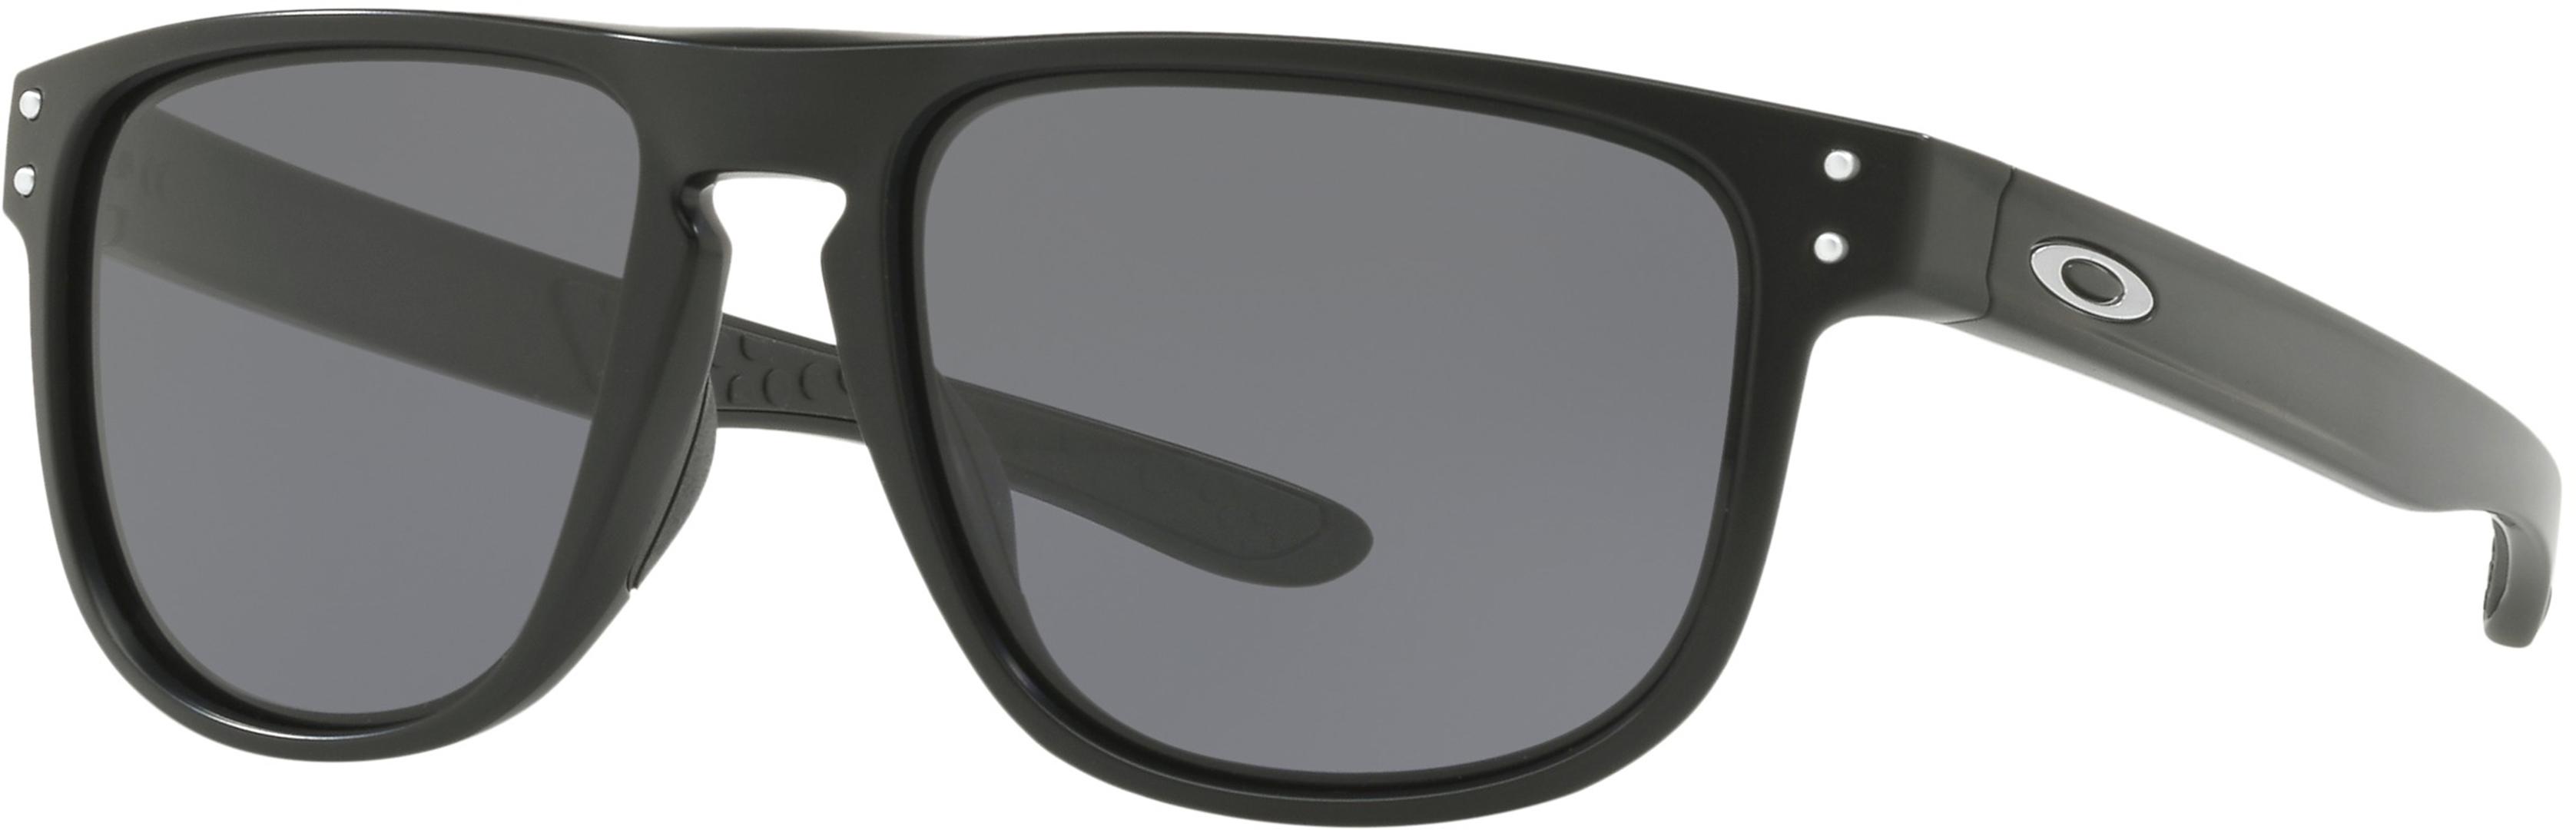 HOLBROOK R Sonnenbrille matte black/grey | Warehouse One